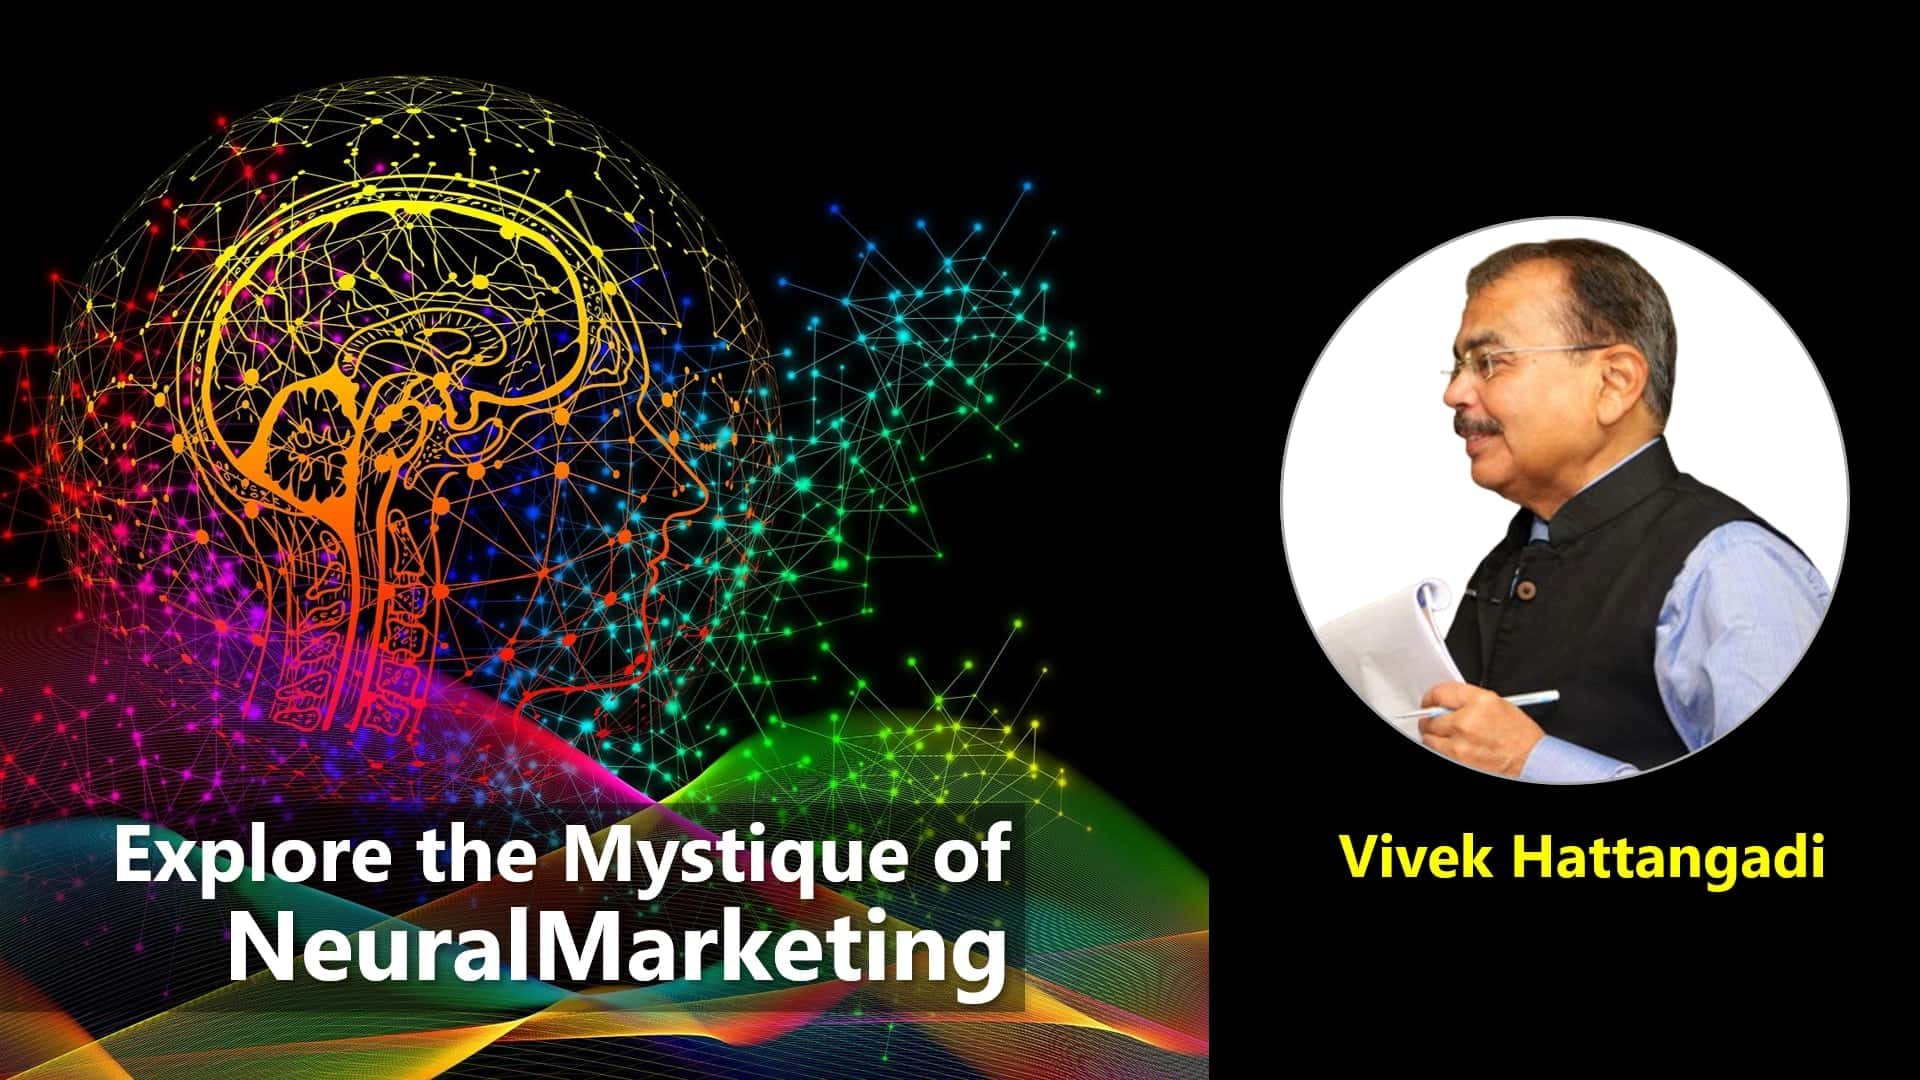 Explore the Mystique of NeuralMarketing